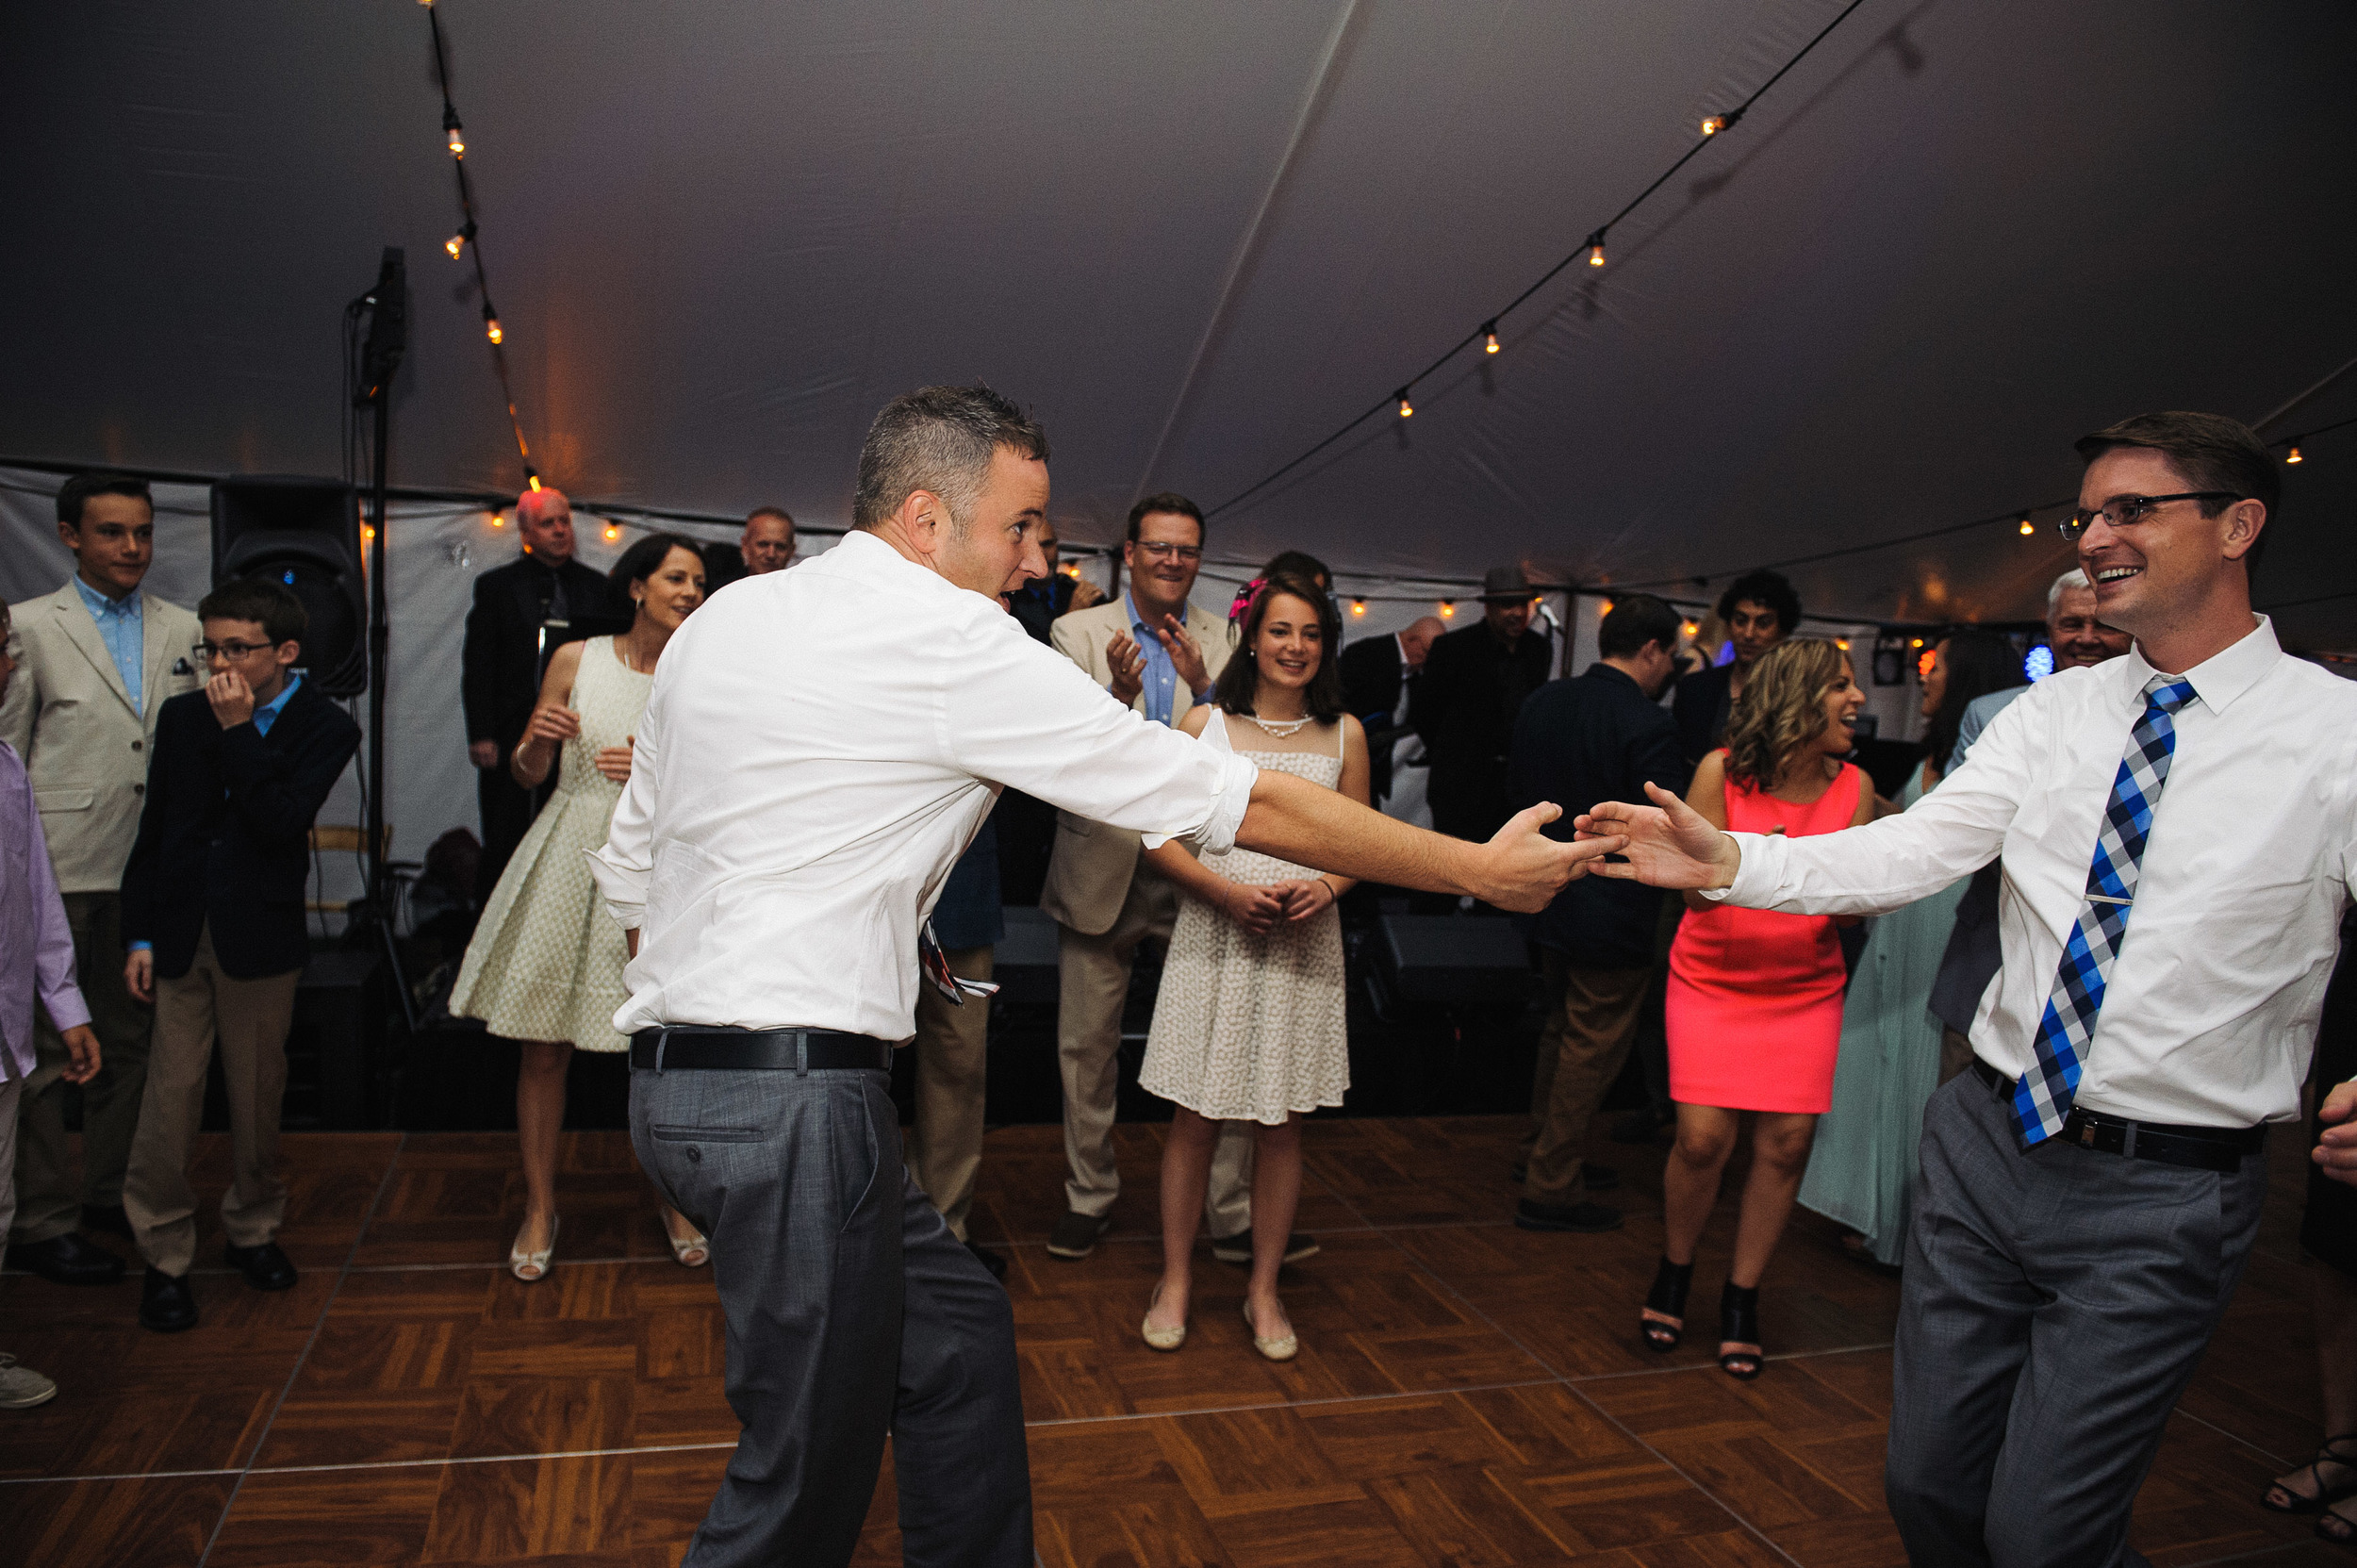 Aviation Themed Wedding Gay Wedding LGBT229.JPG